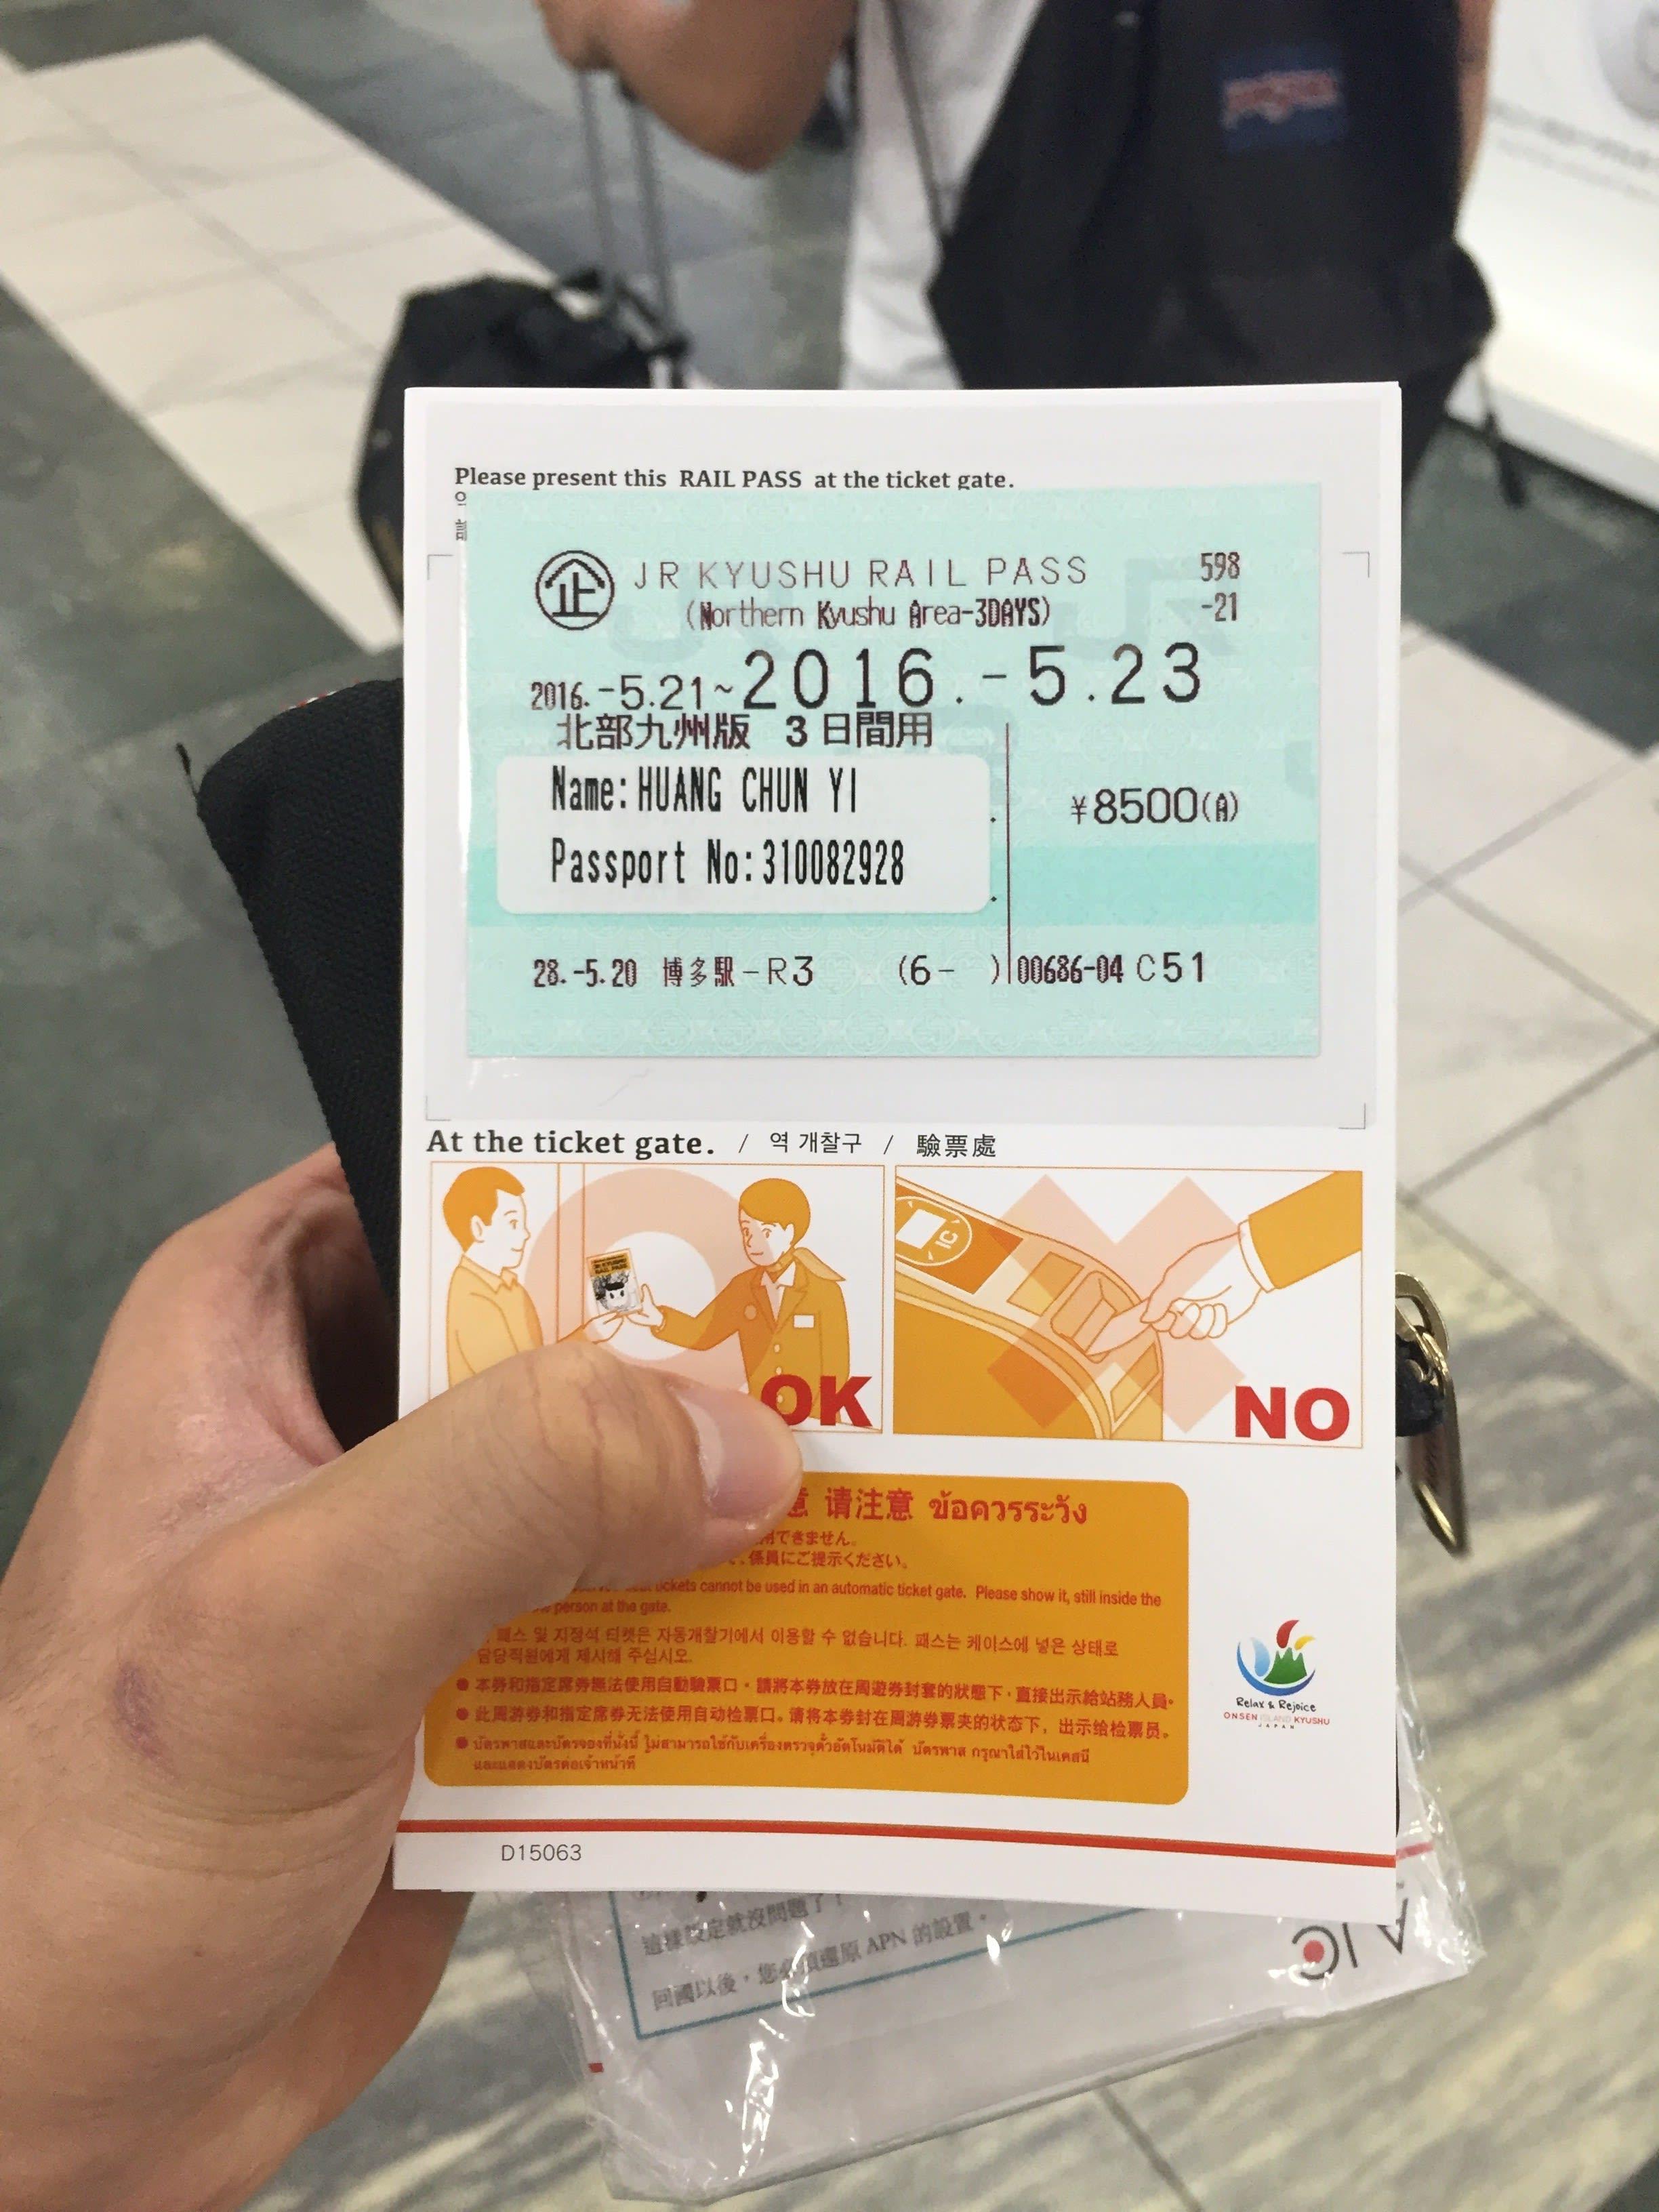 JR PASS北九州鐵路周遊券−背面會有使用人資訊、還有可以使用時間。Photo|Zach